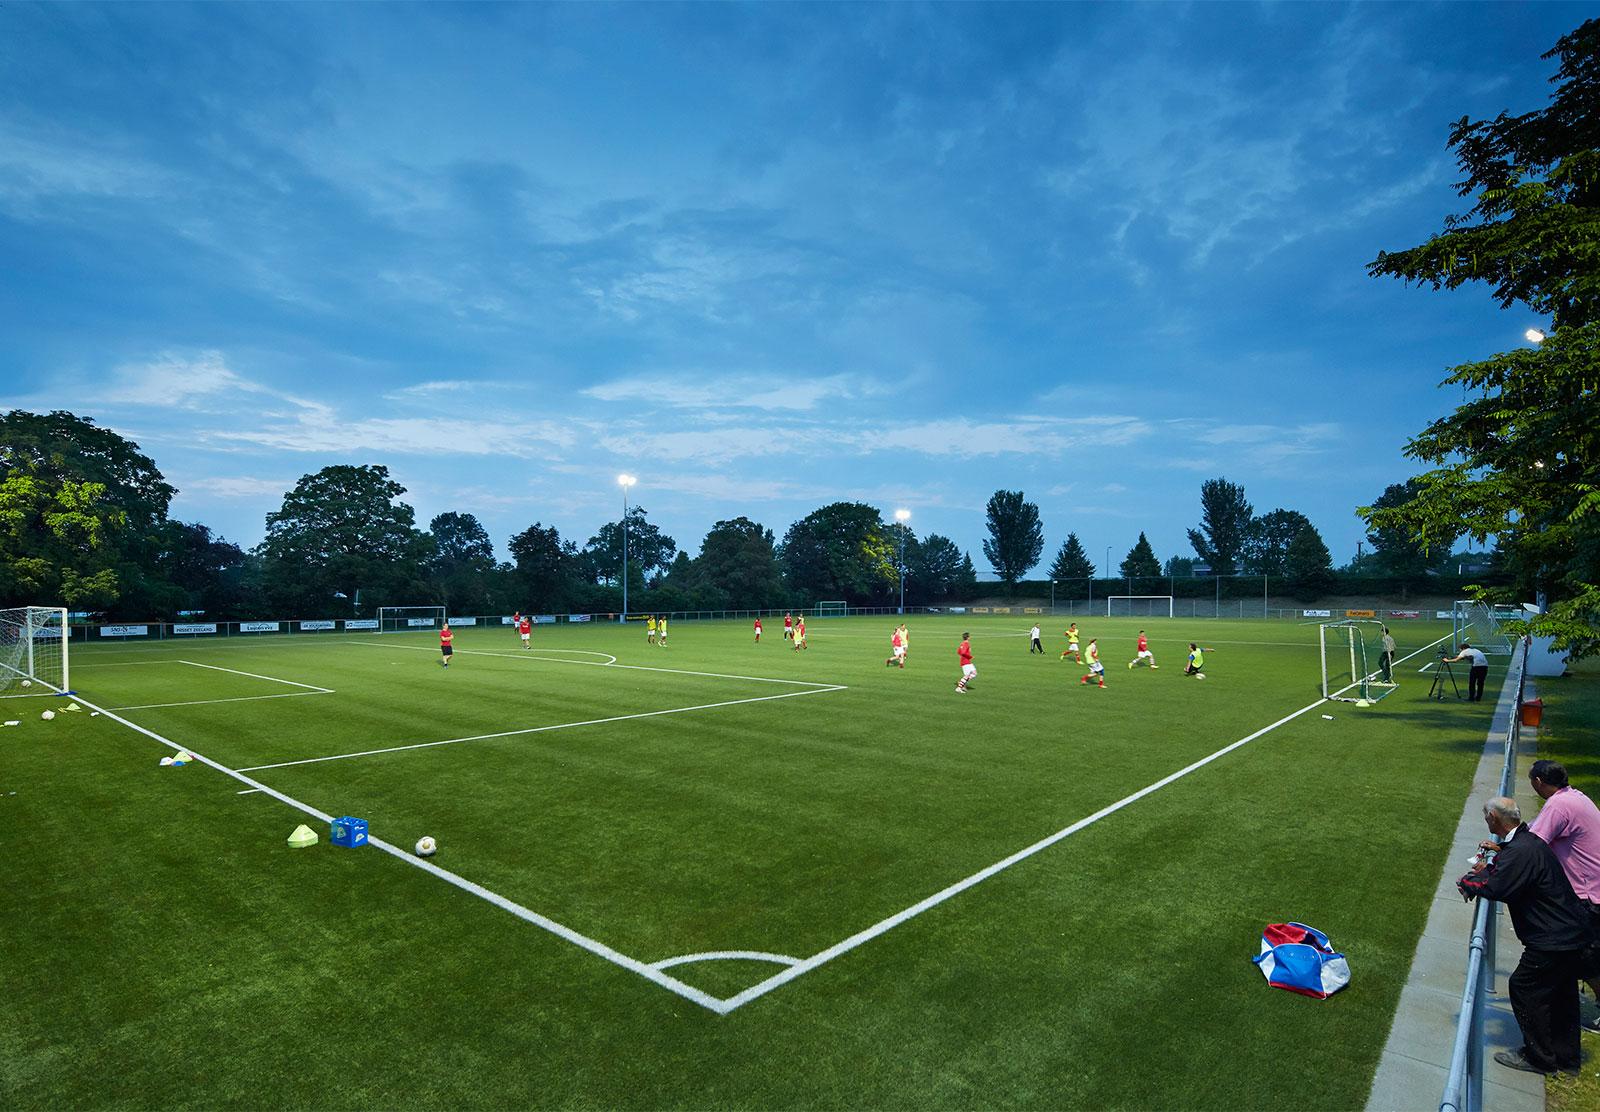 https://sportverlichting.com/wp-content/uploads/2019/10/home-voetbal.jpg